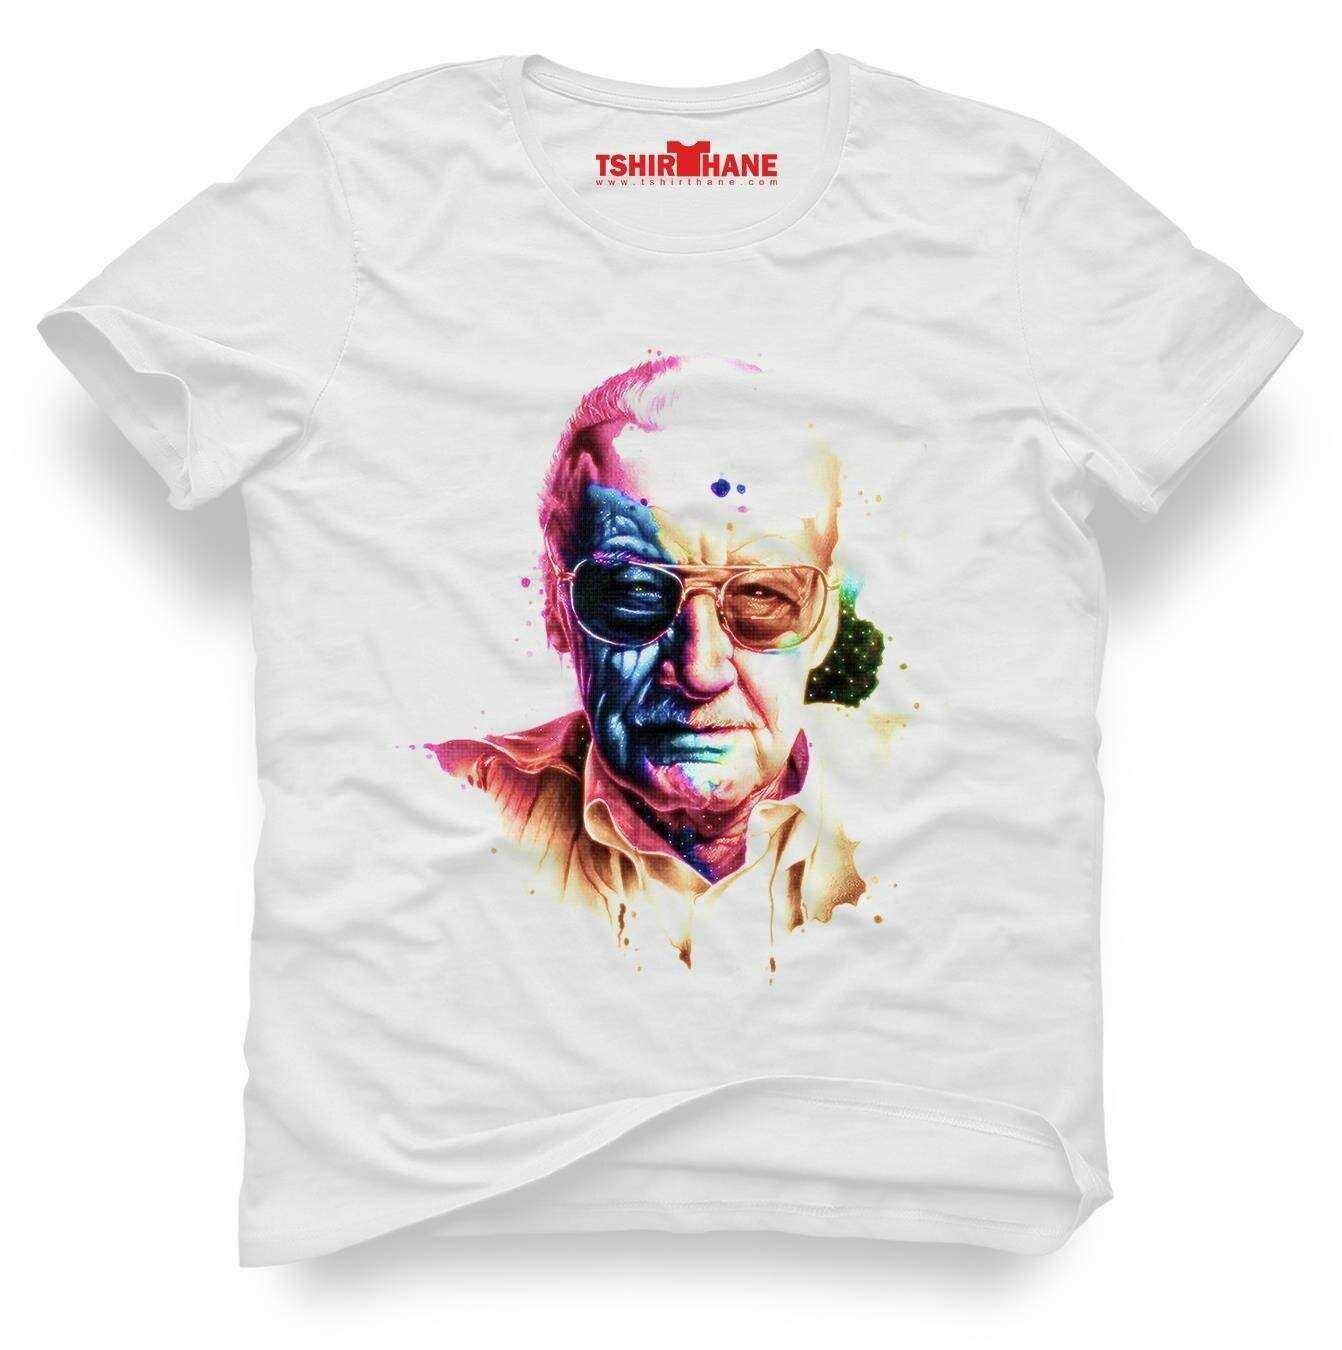 Tshirthane stan lee marvel color Tişört Erkek Tshirt